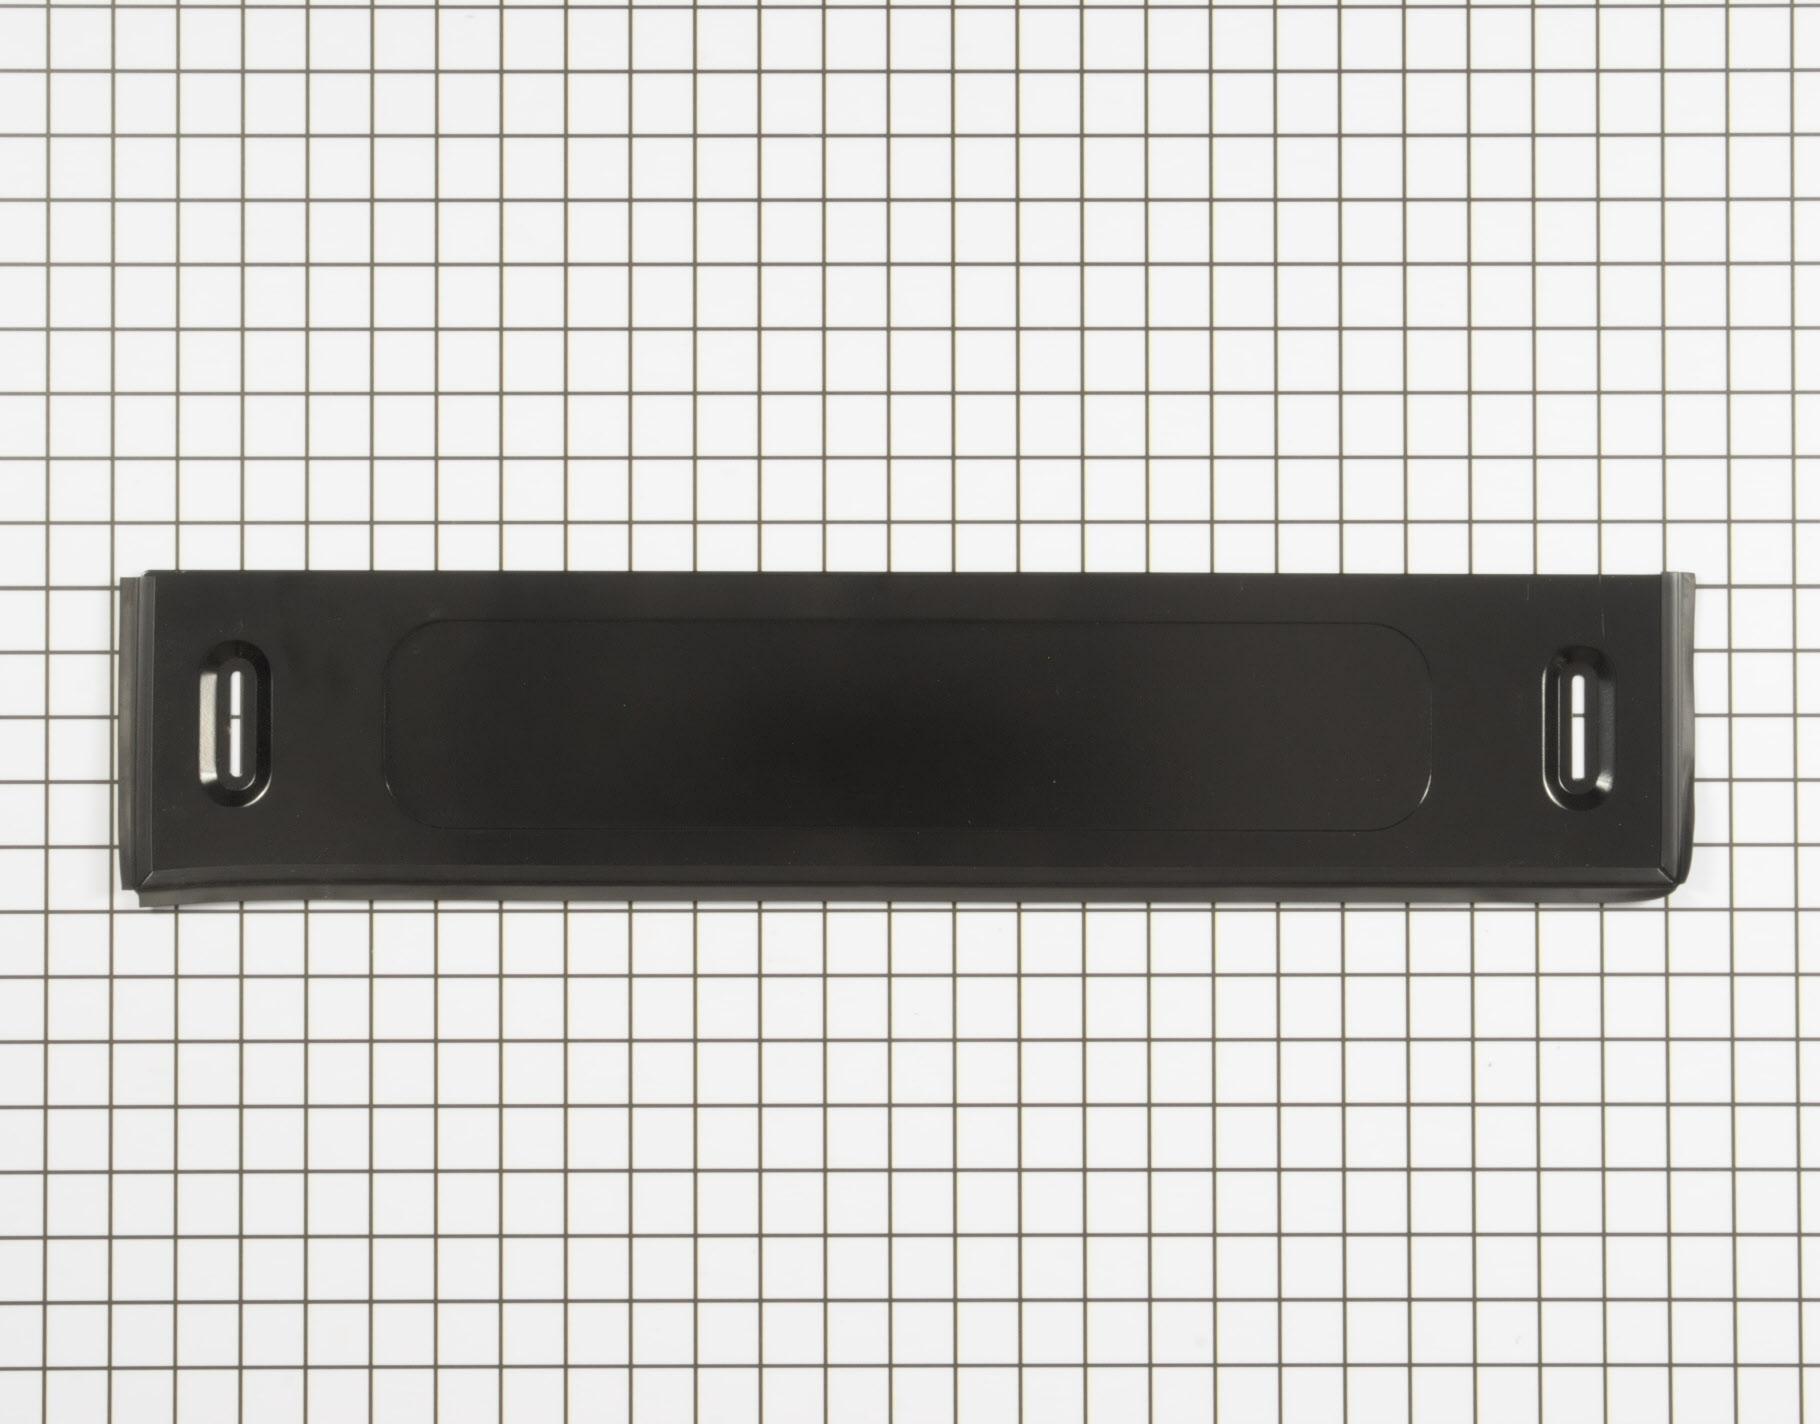 DD82-01102A Samsung Dishwasher Part -Bottom Panel